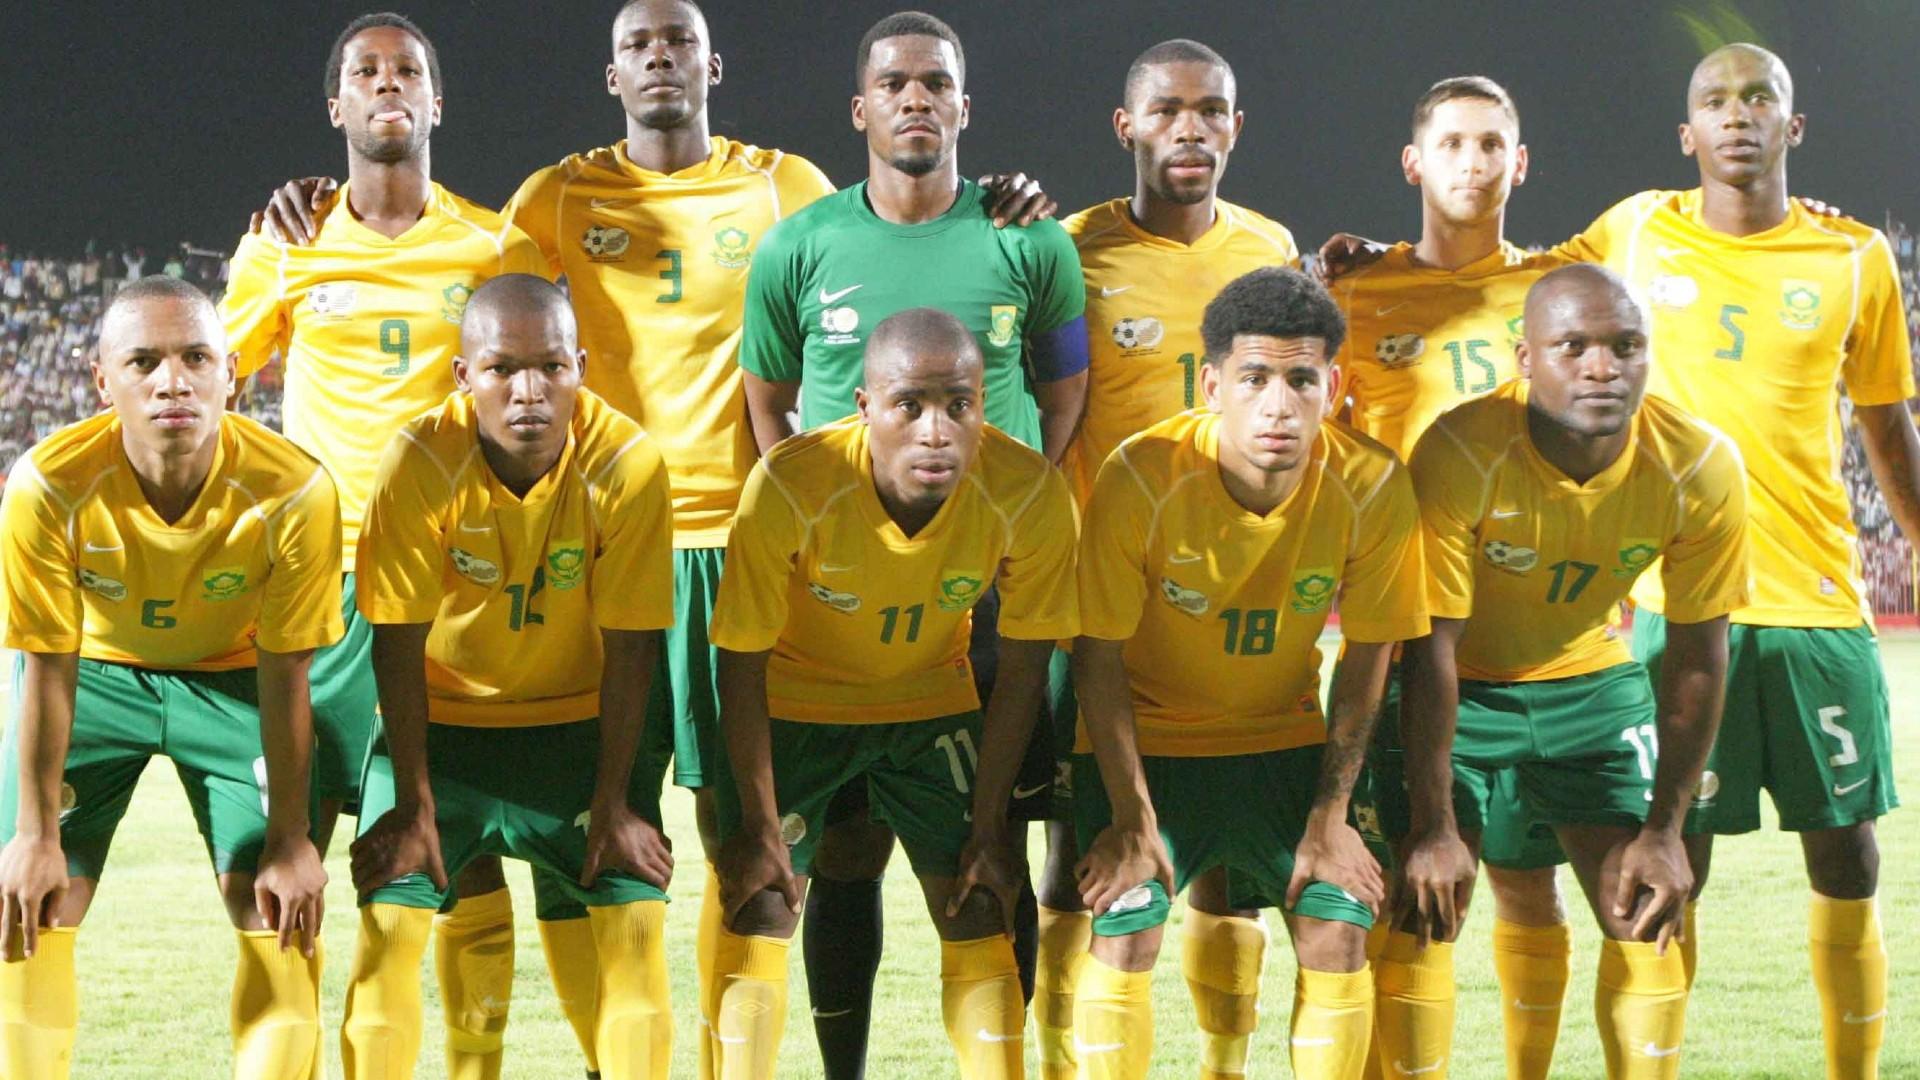 bafana bafana starting line up vs sudan 2014 u8uapmvd73gg1izgip7gusp7k